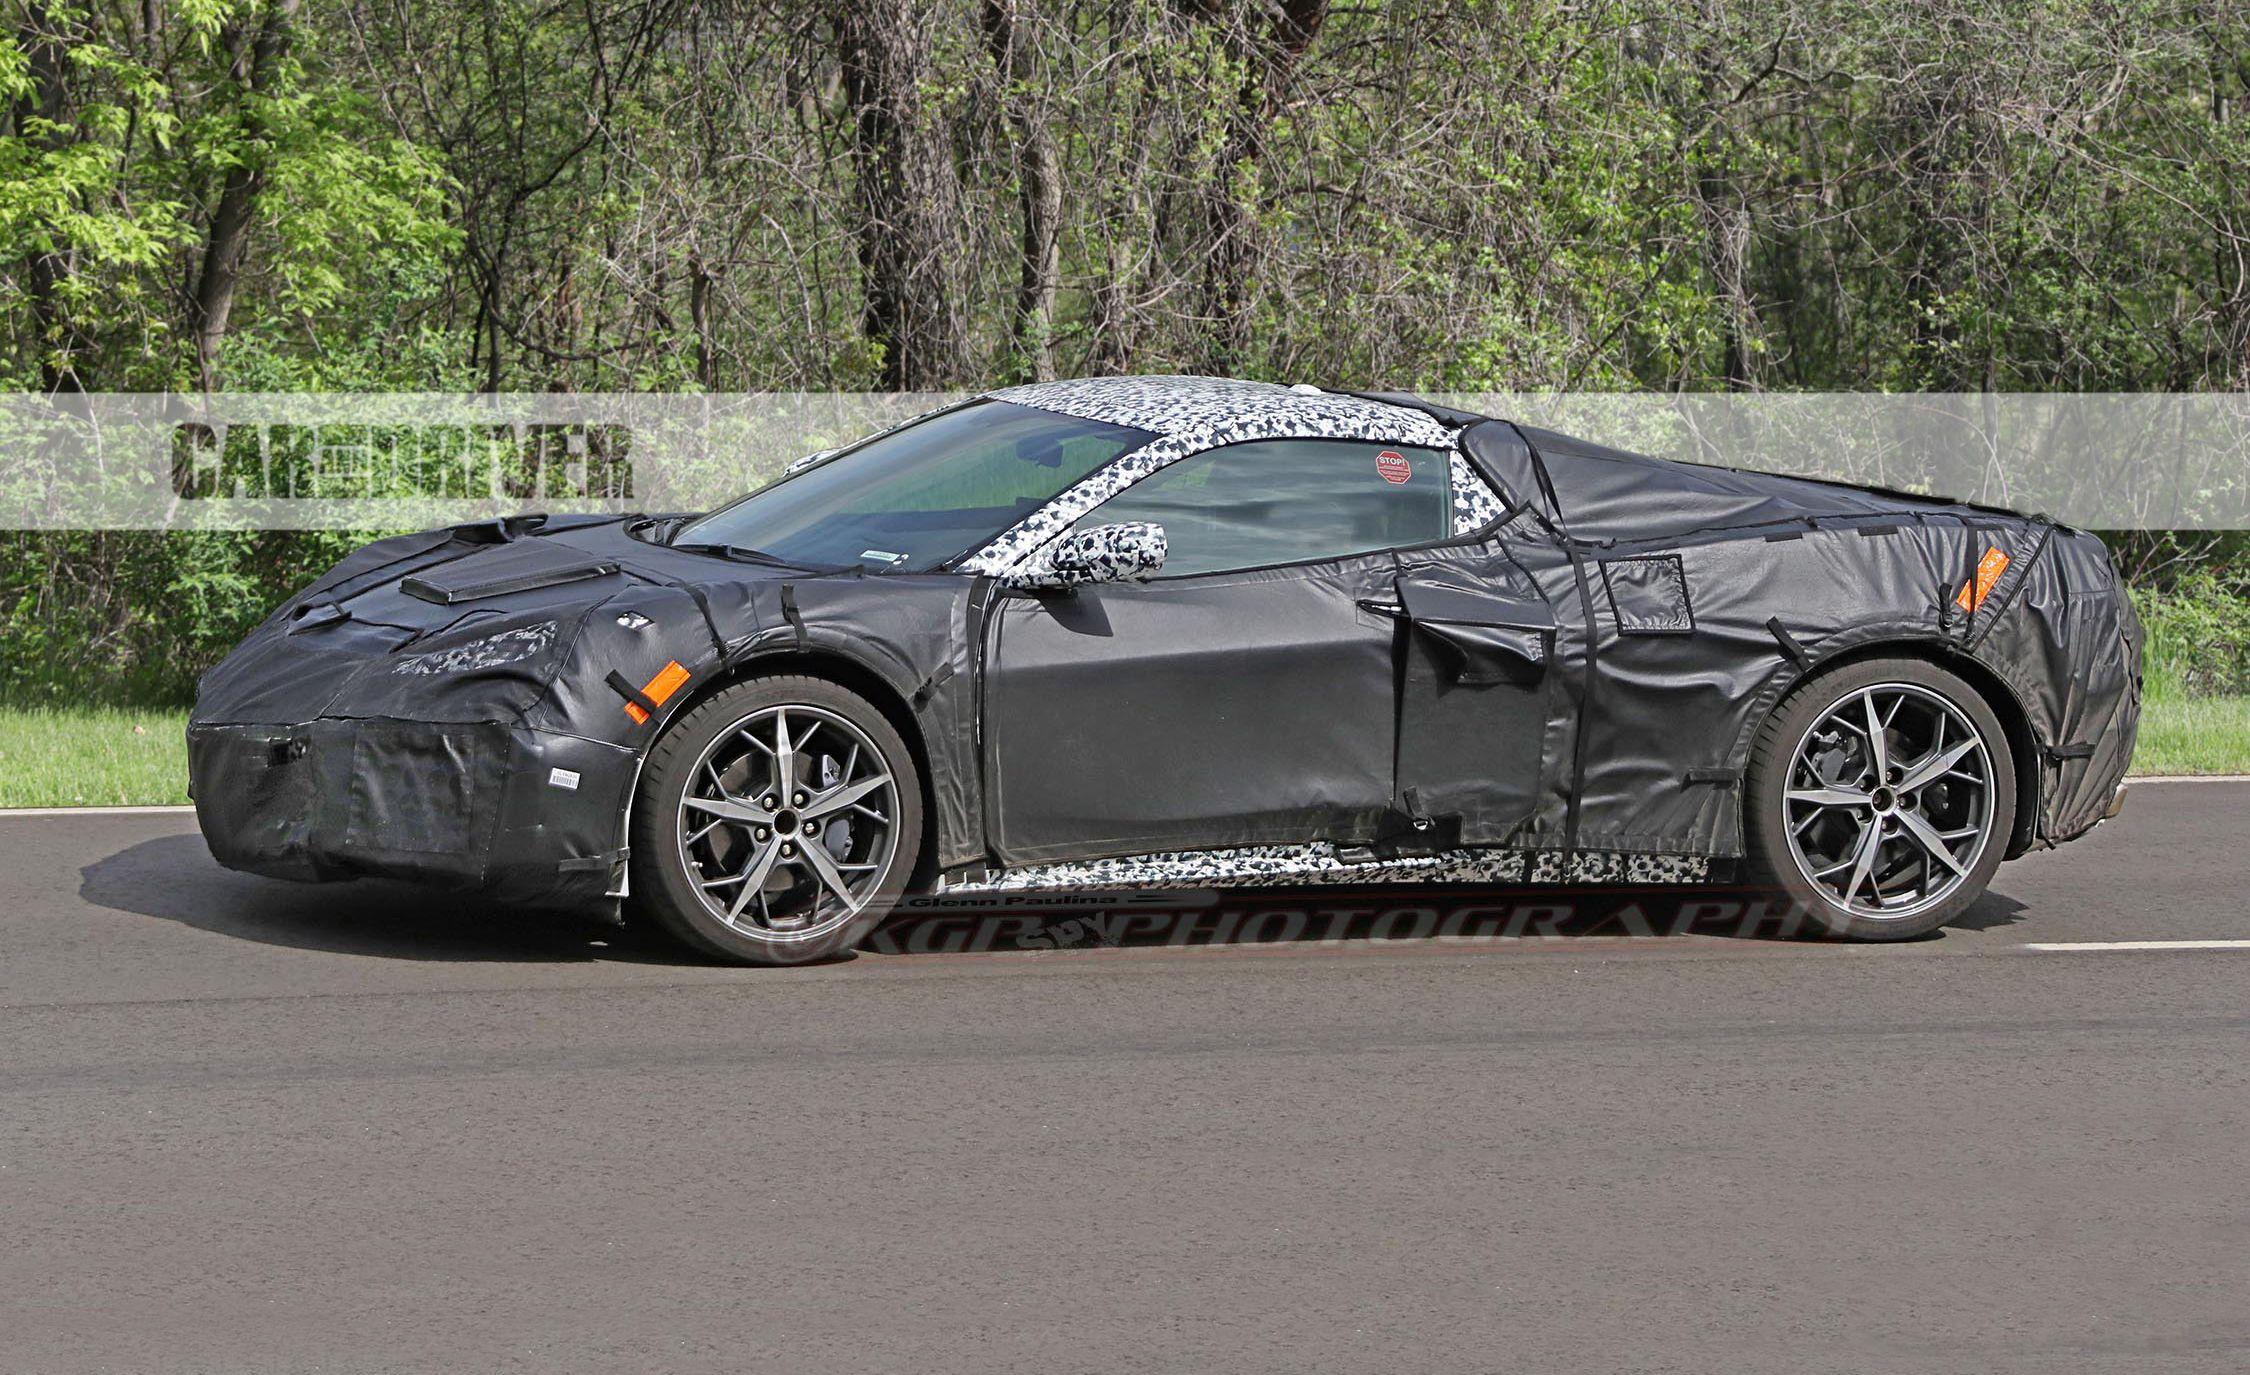 2020 Chevrolet Corvette C8 Fresh Spy Shots Reveal New